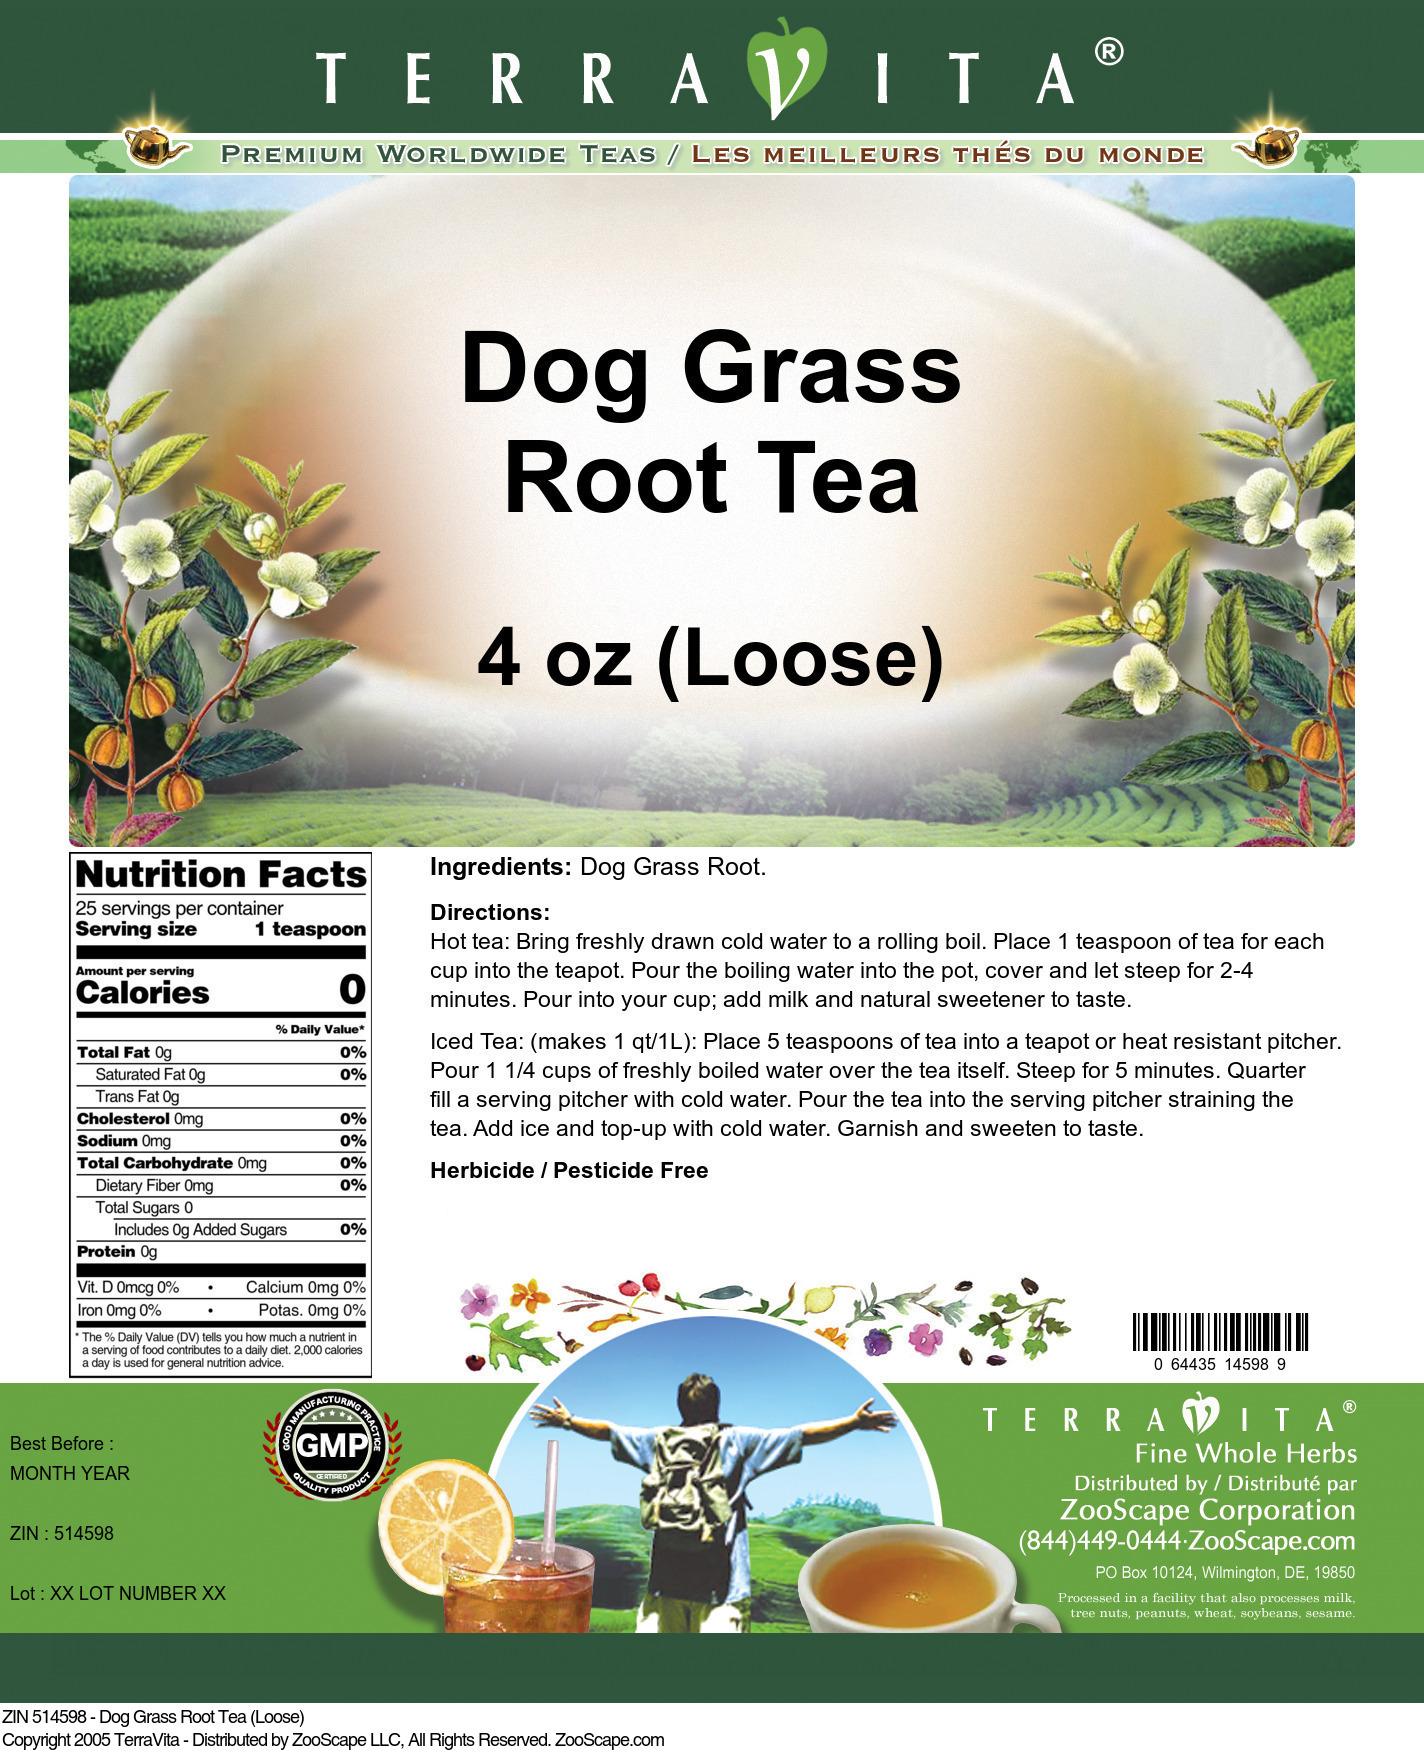 Dog Grass Root